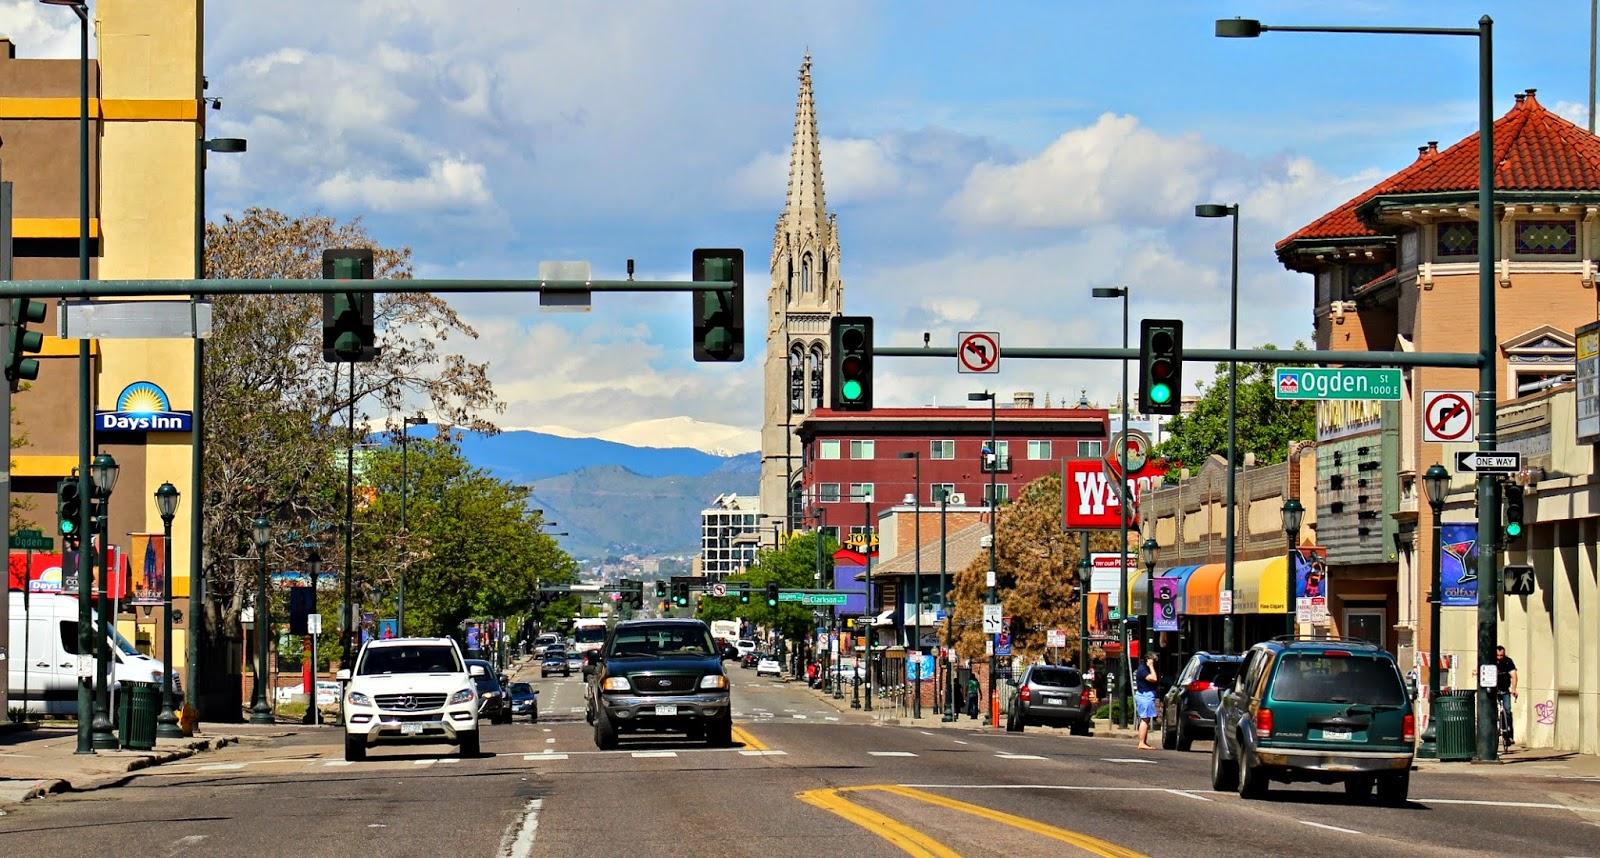 50 after 40: 2015 Denver Colfax Marathon Review